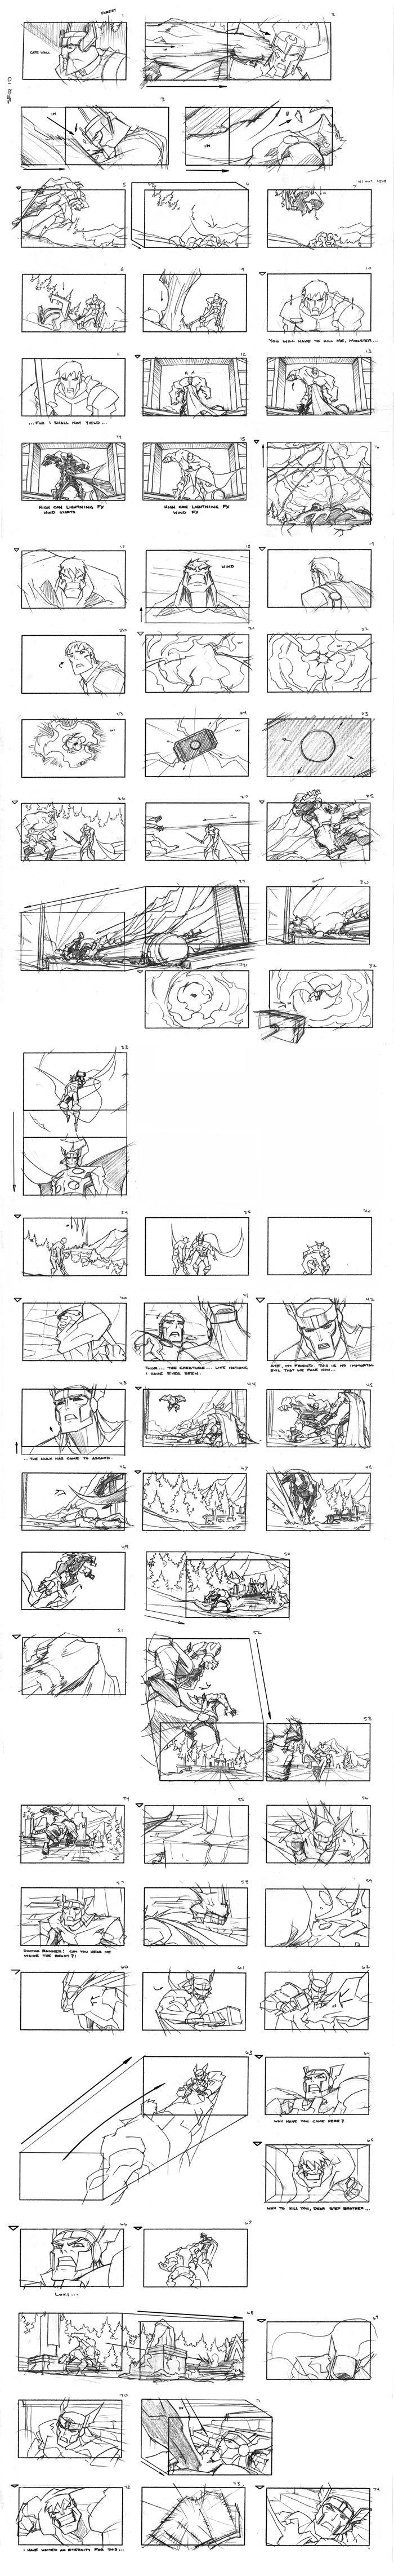 Thor Storyboard Pt. 1 by samliu on deviantART